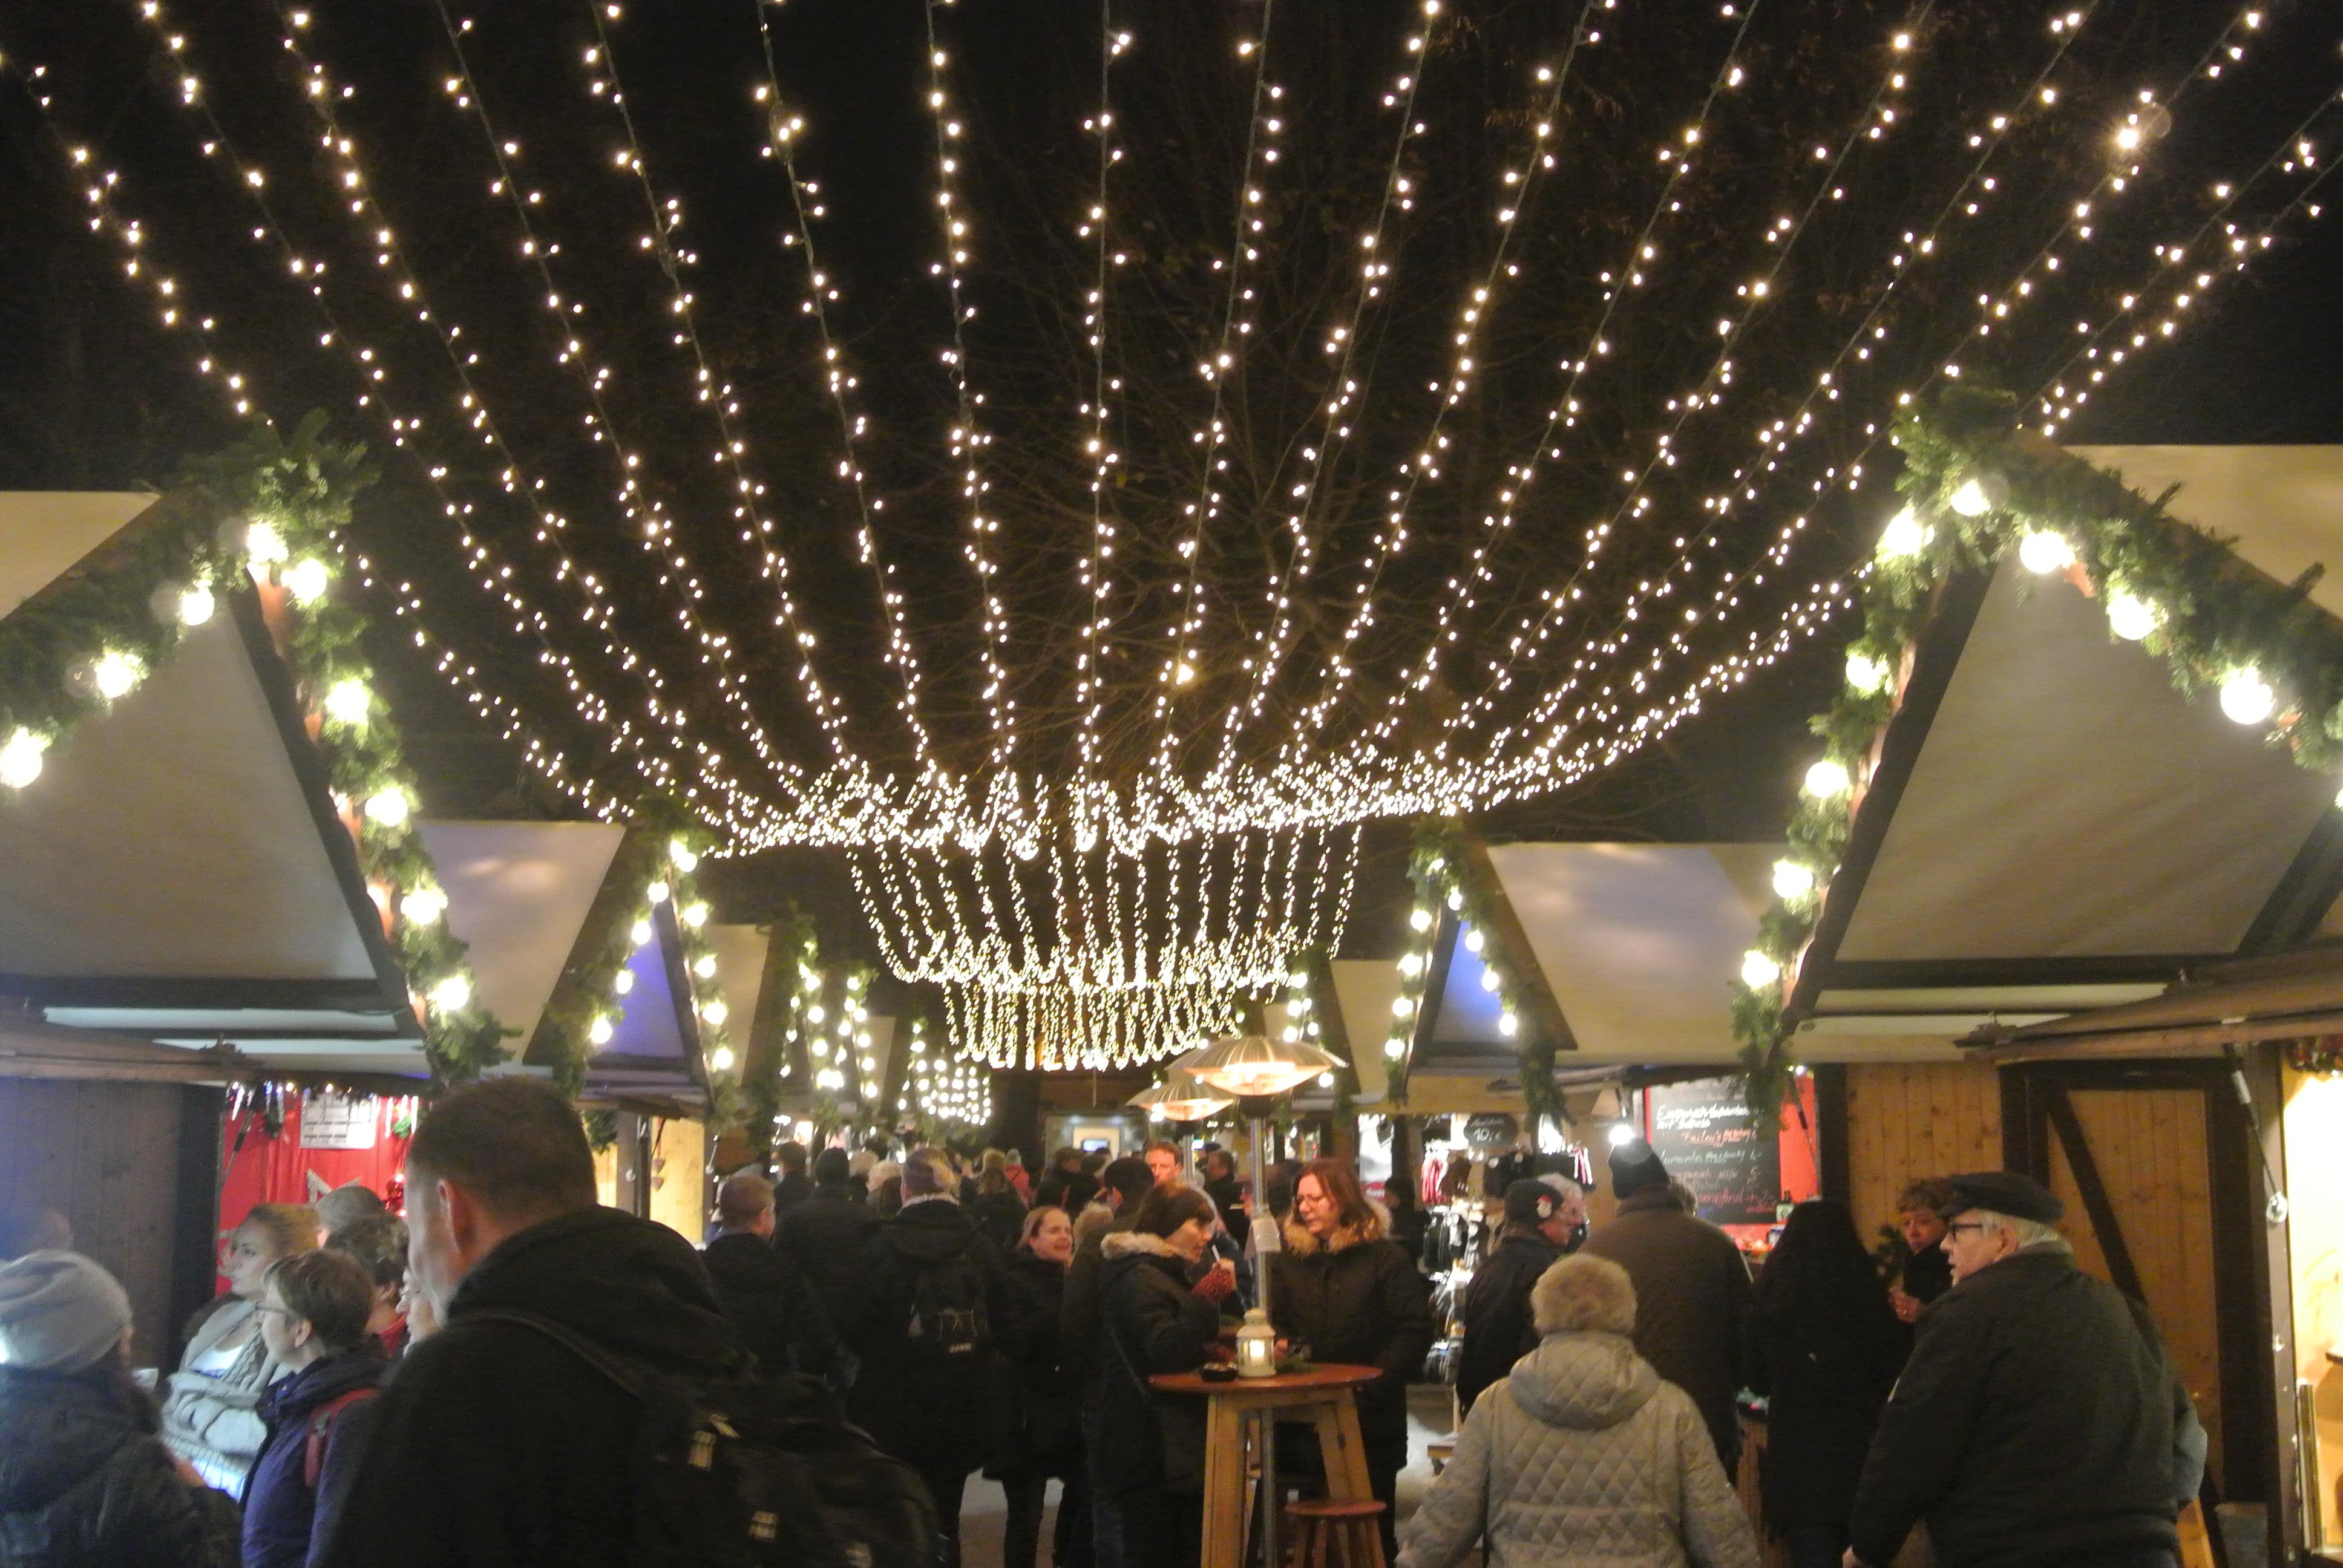 A German Christmas Market - photo by Juliamaud